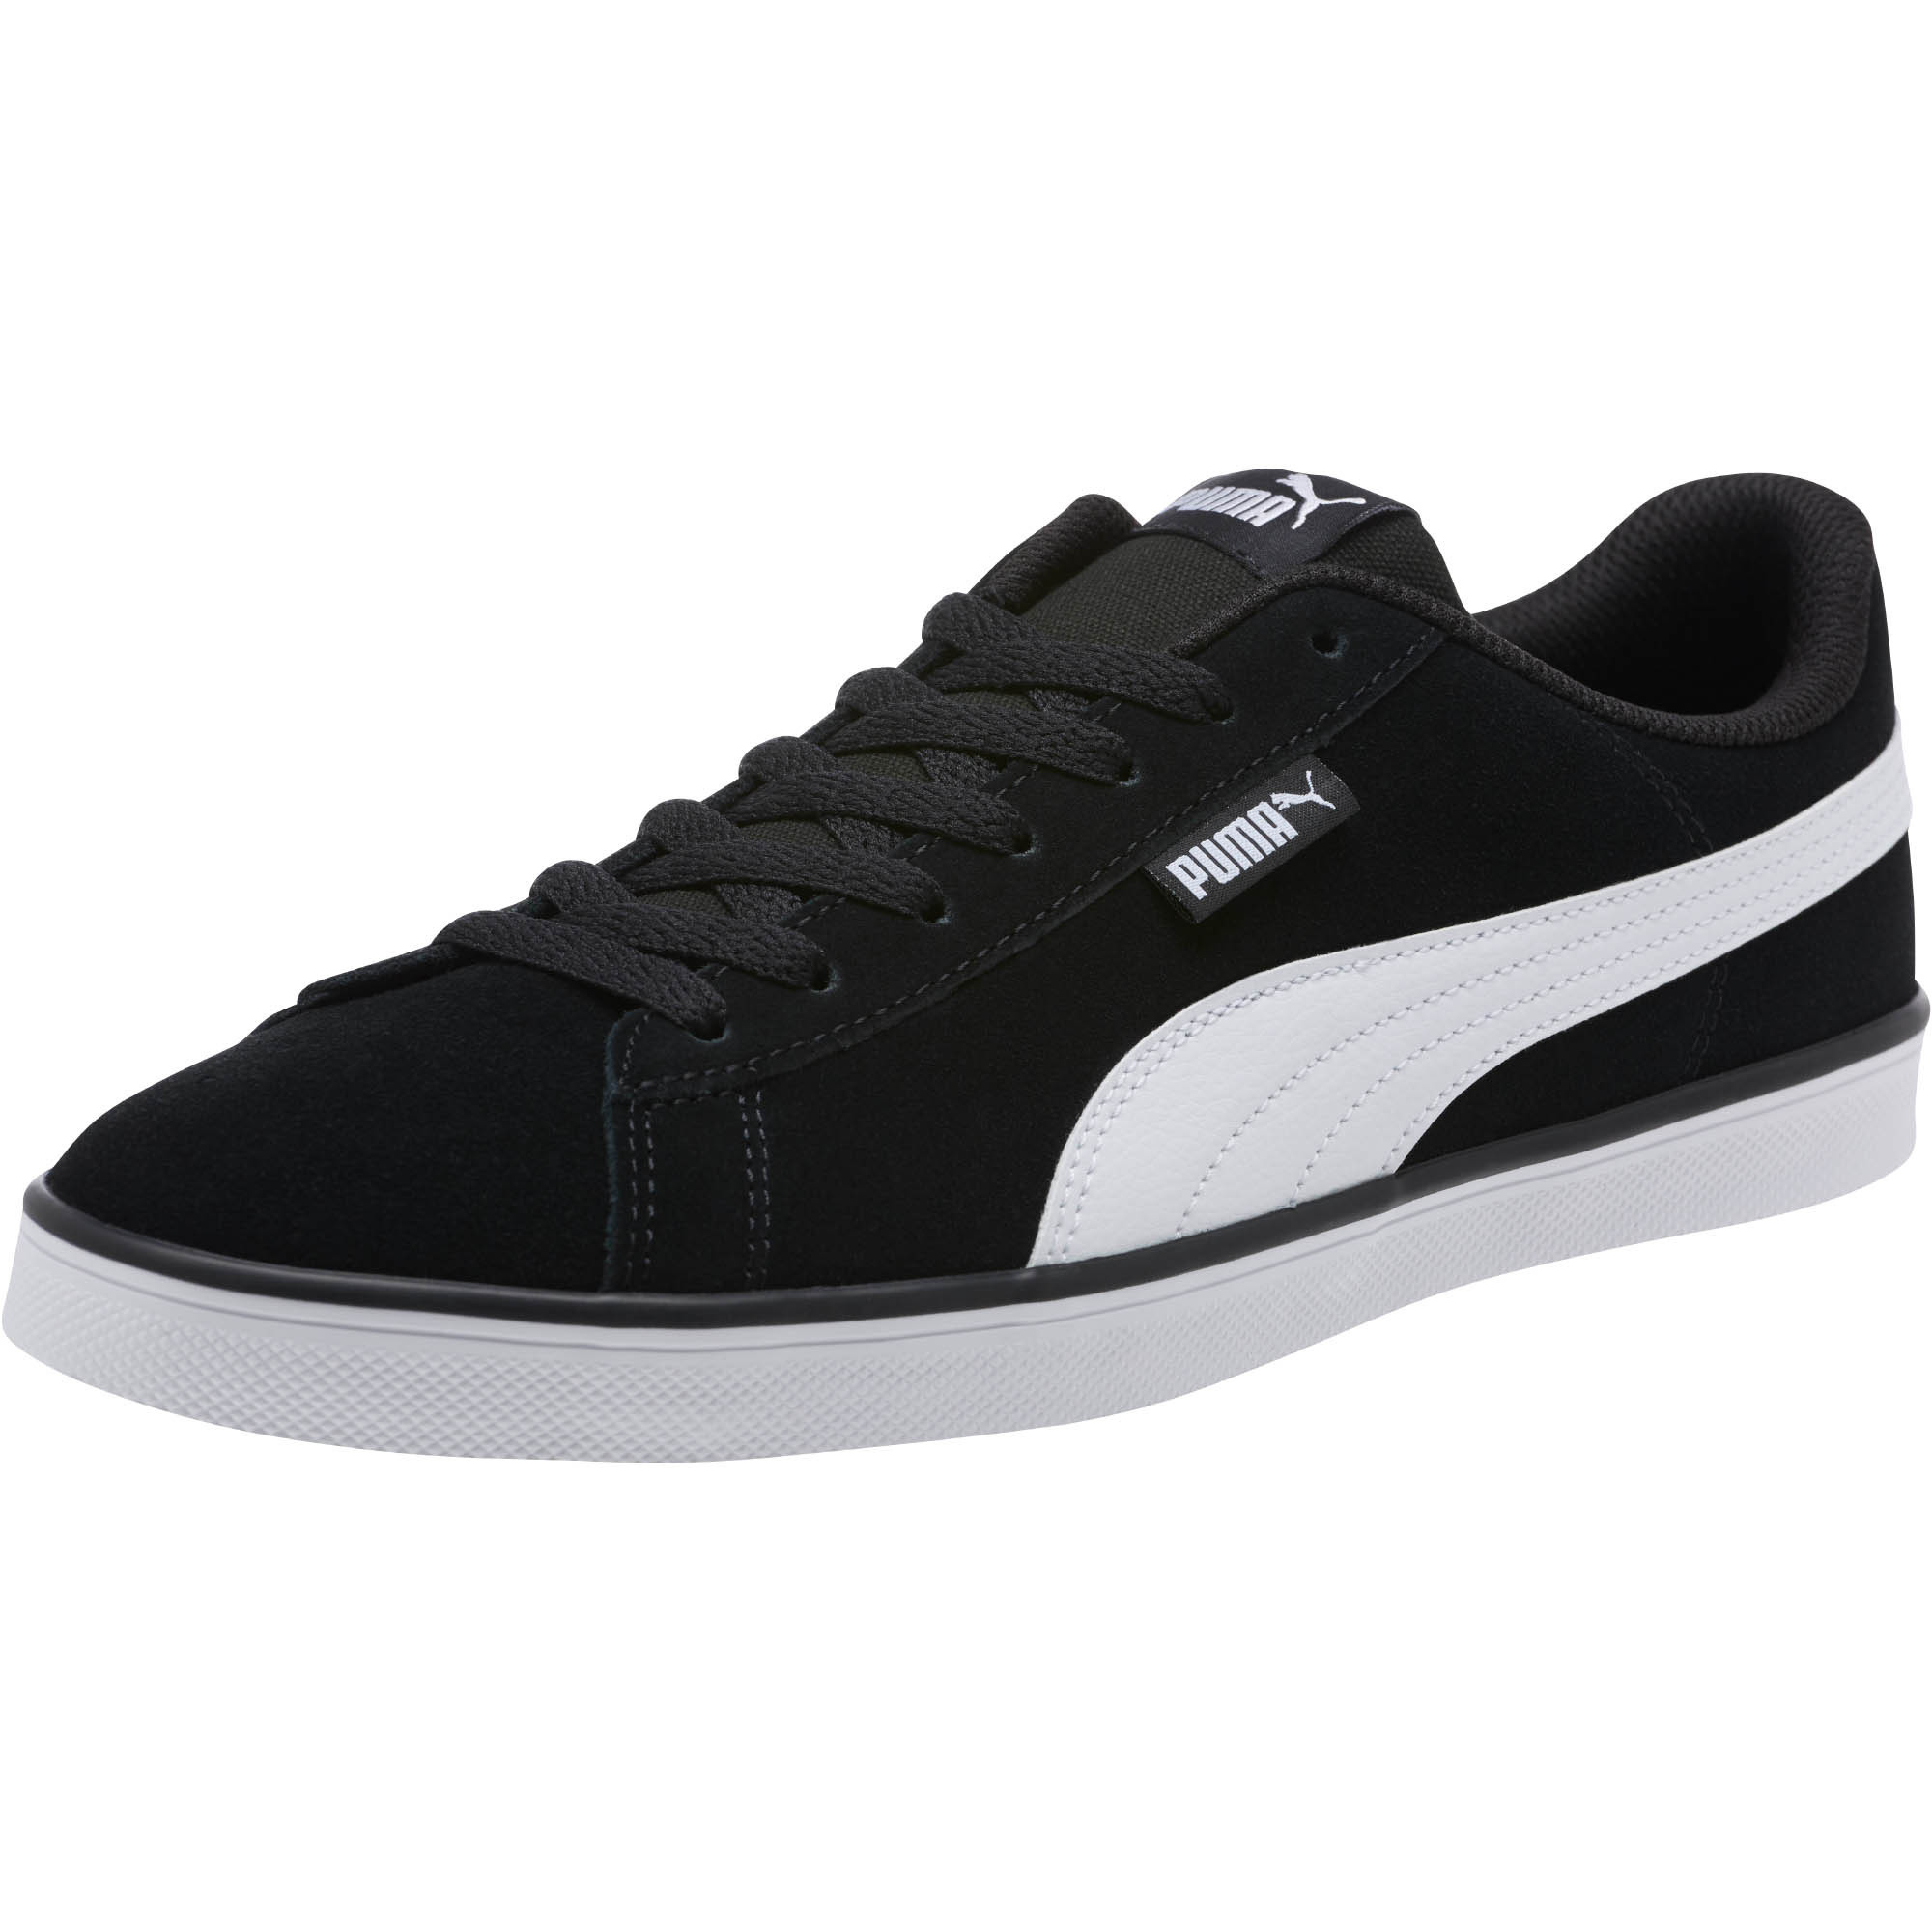 PUMA-Urban-Plus-Suede-Sneakers-Men-Shoe-Basics thumbnail 18